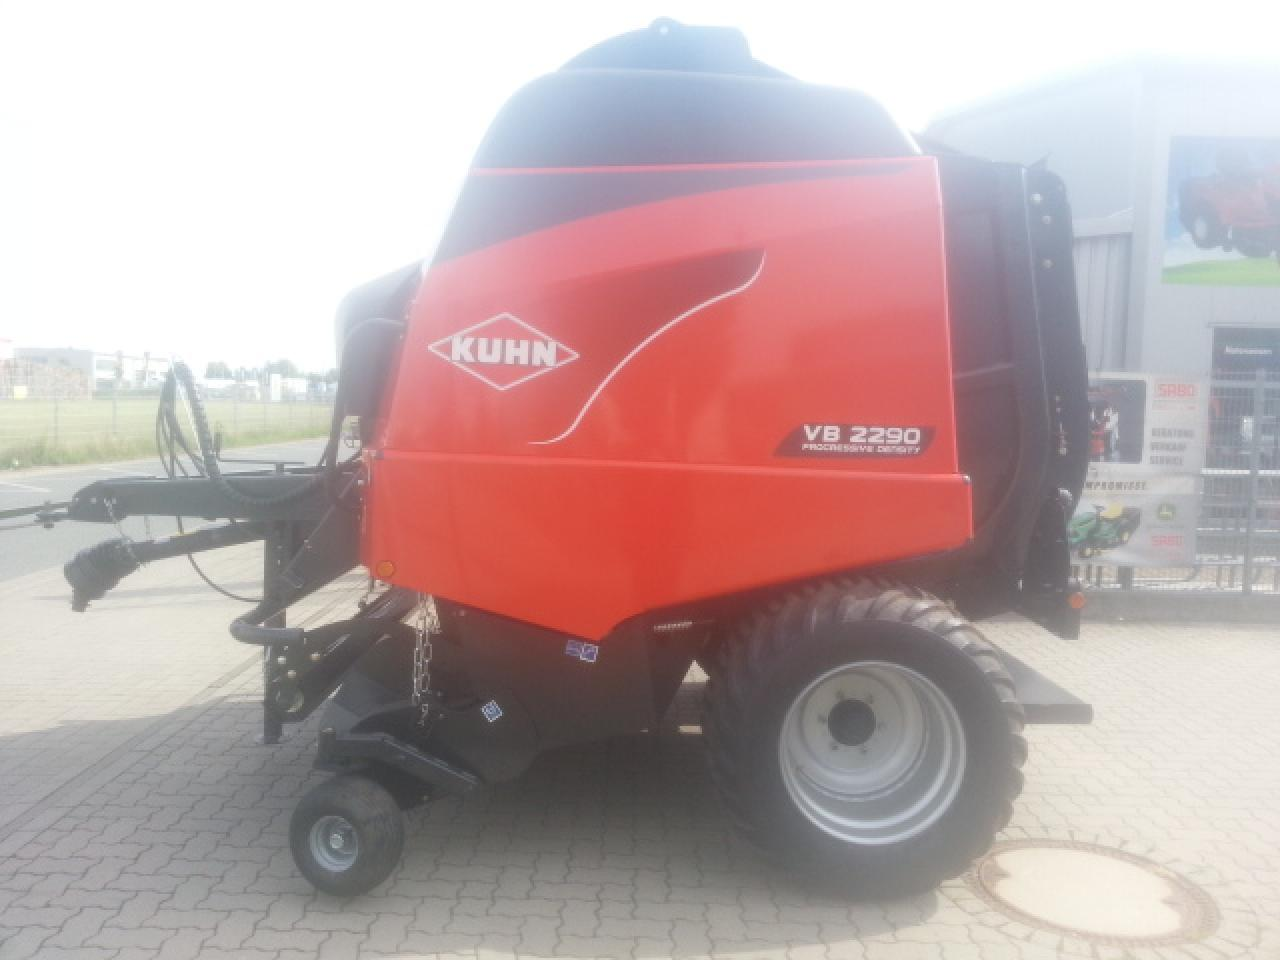 Kuhn VB 2290 OC 14